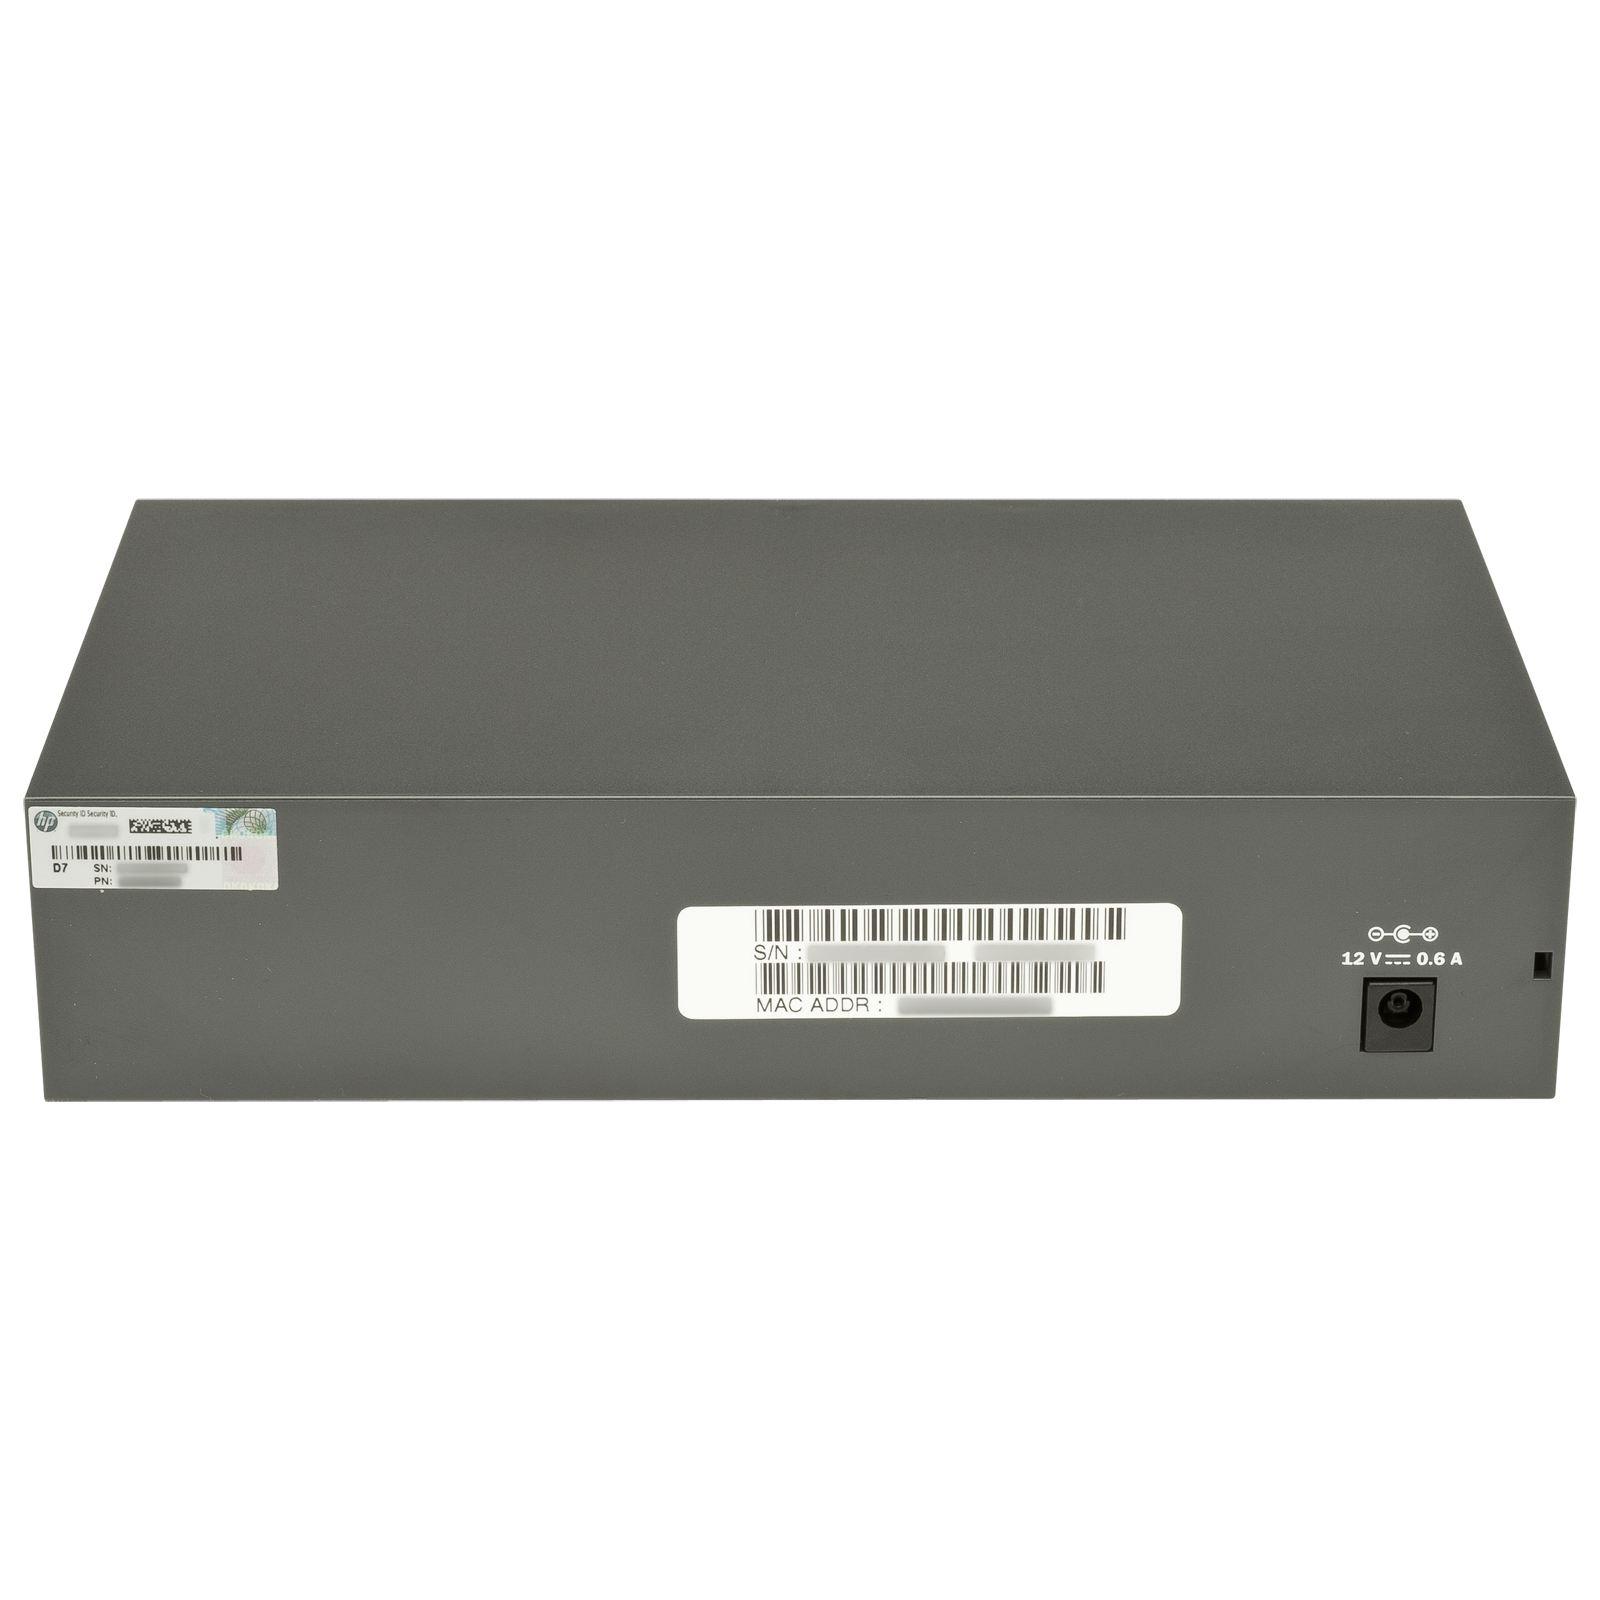 HPE 1810-8G v2 Switch (J9802A) - Product documentation